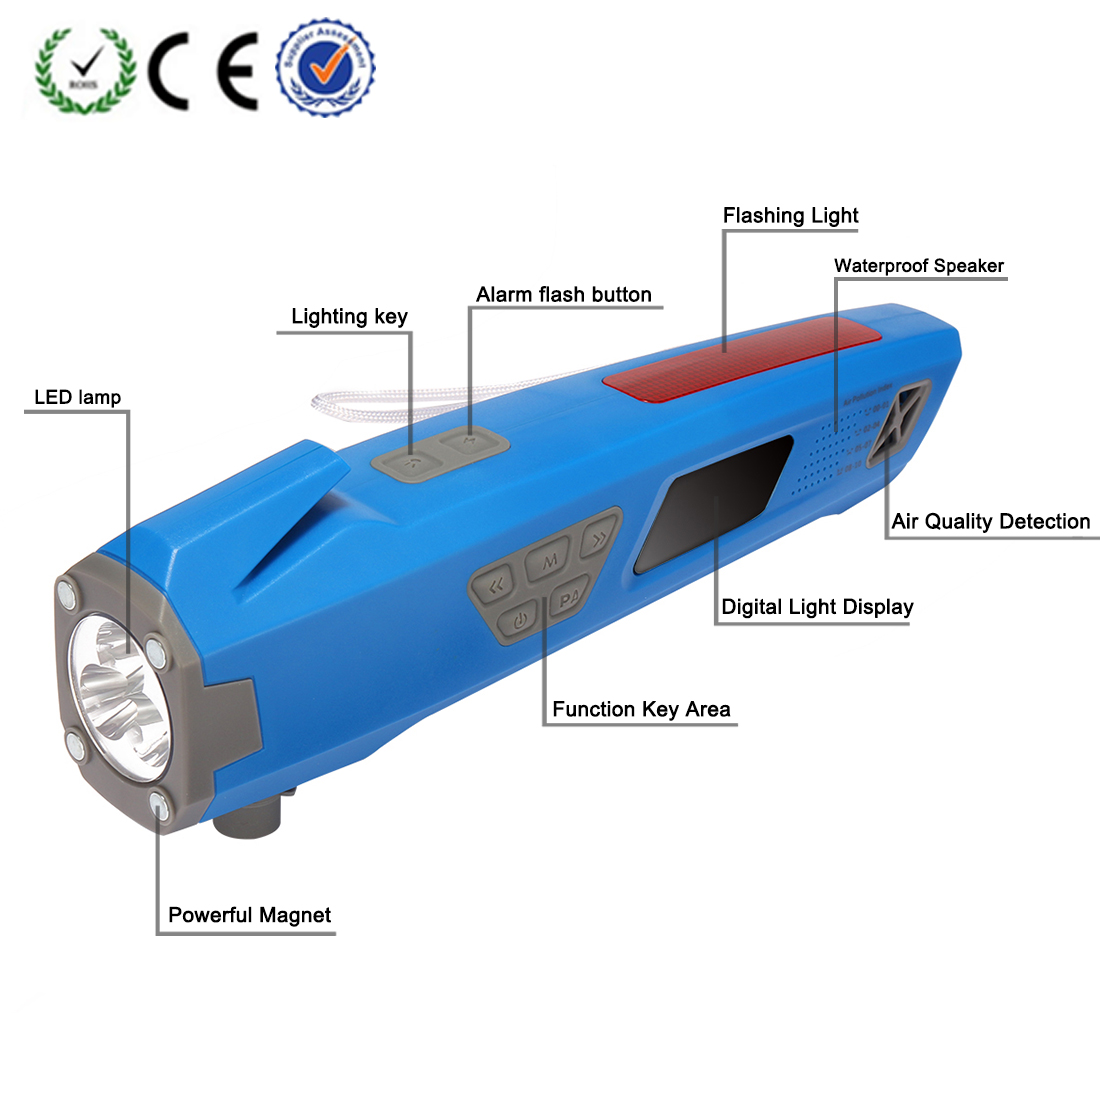 XLN-711 Multi-functional Flashlight Air Quality Testing Car Emergency Tool Blue